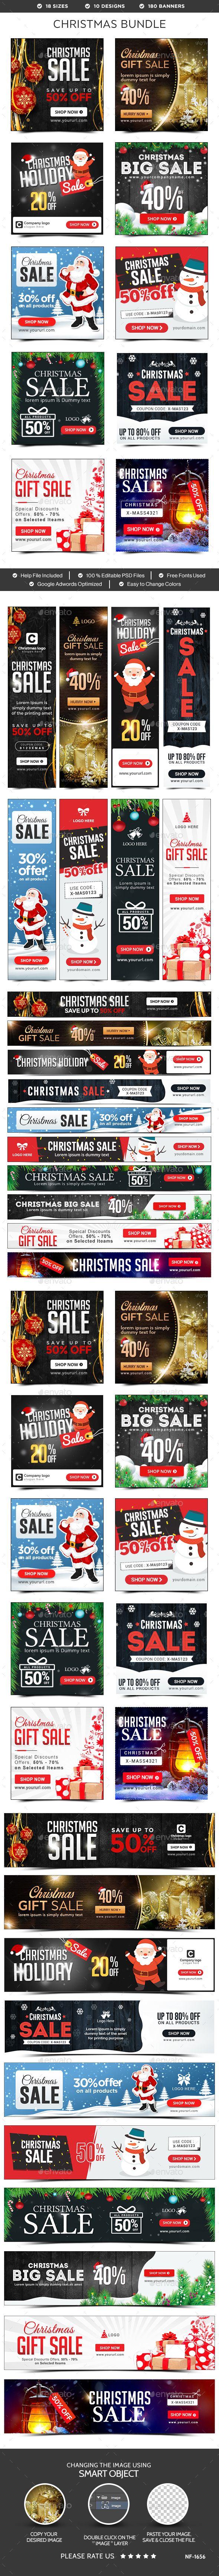 Christmas Banners Template PSD Bundle - 10 Sets - 180 Banners #xmas #ads